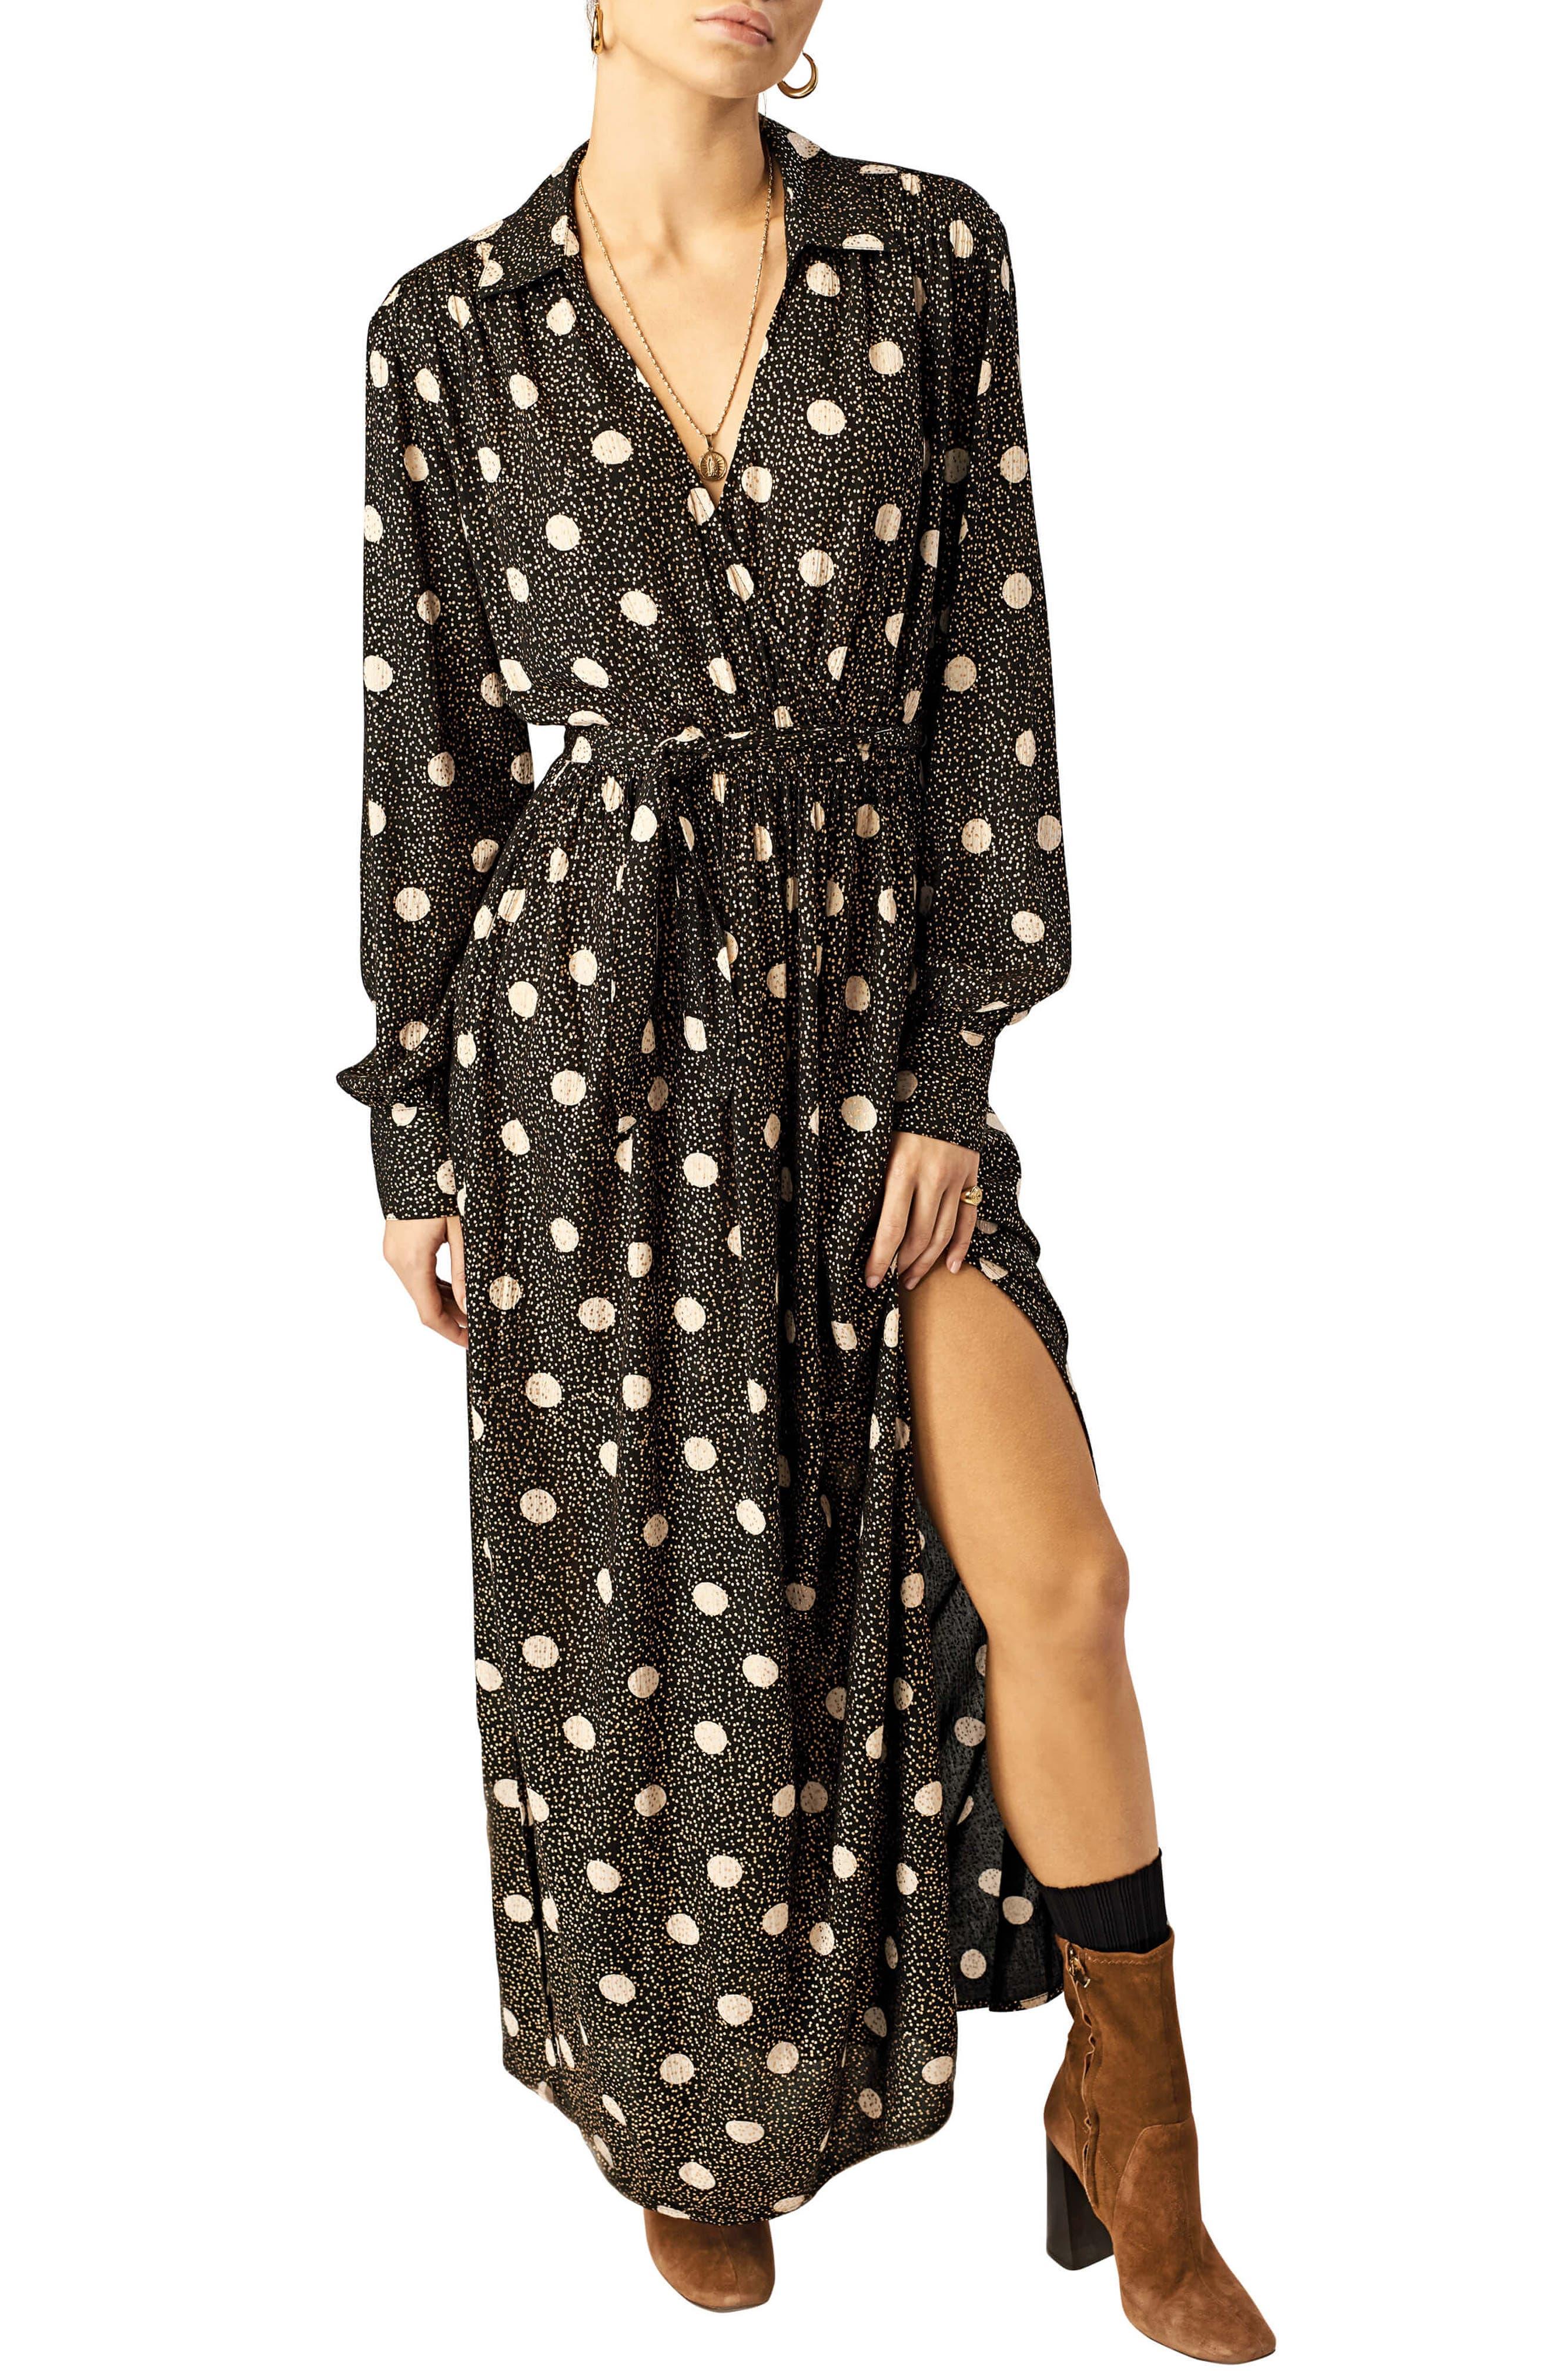 STONE ROW,                             Smoka Dot Surplice Maxi Dress,                             Main thumbnail 1, color,                             BLACK COMBO